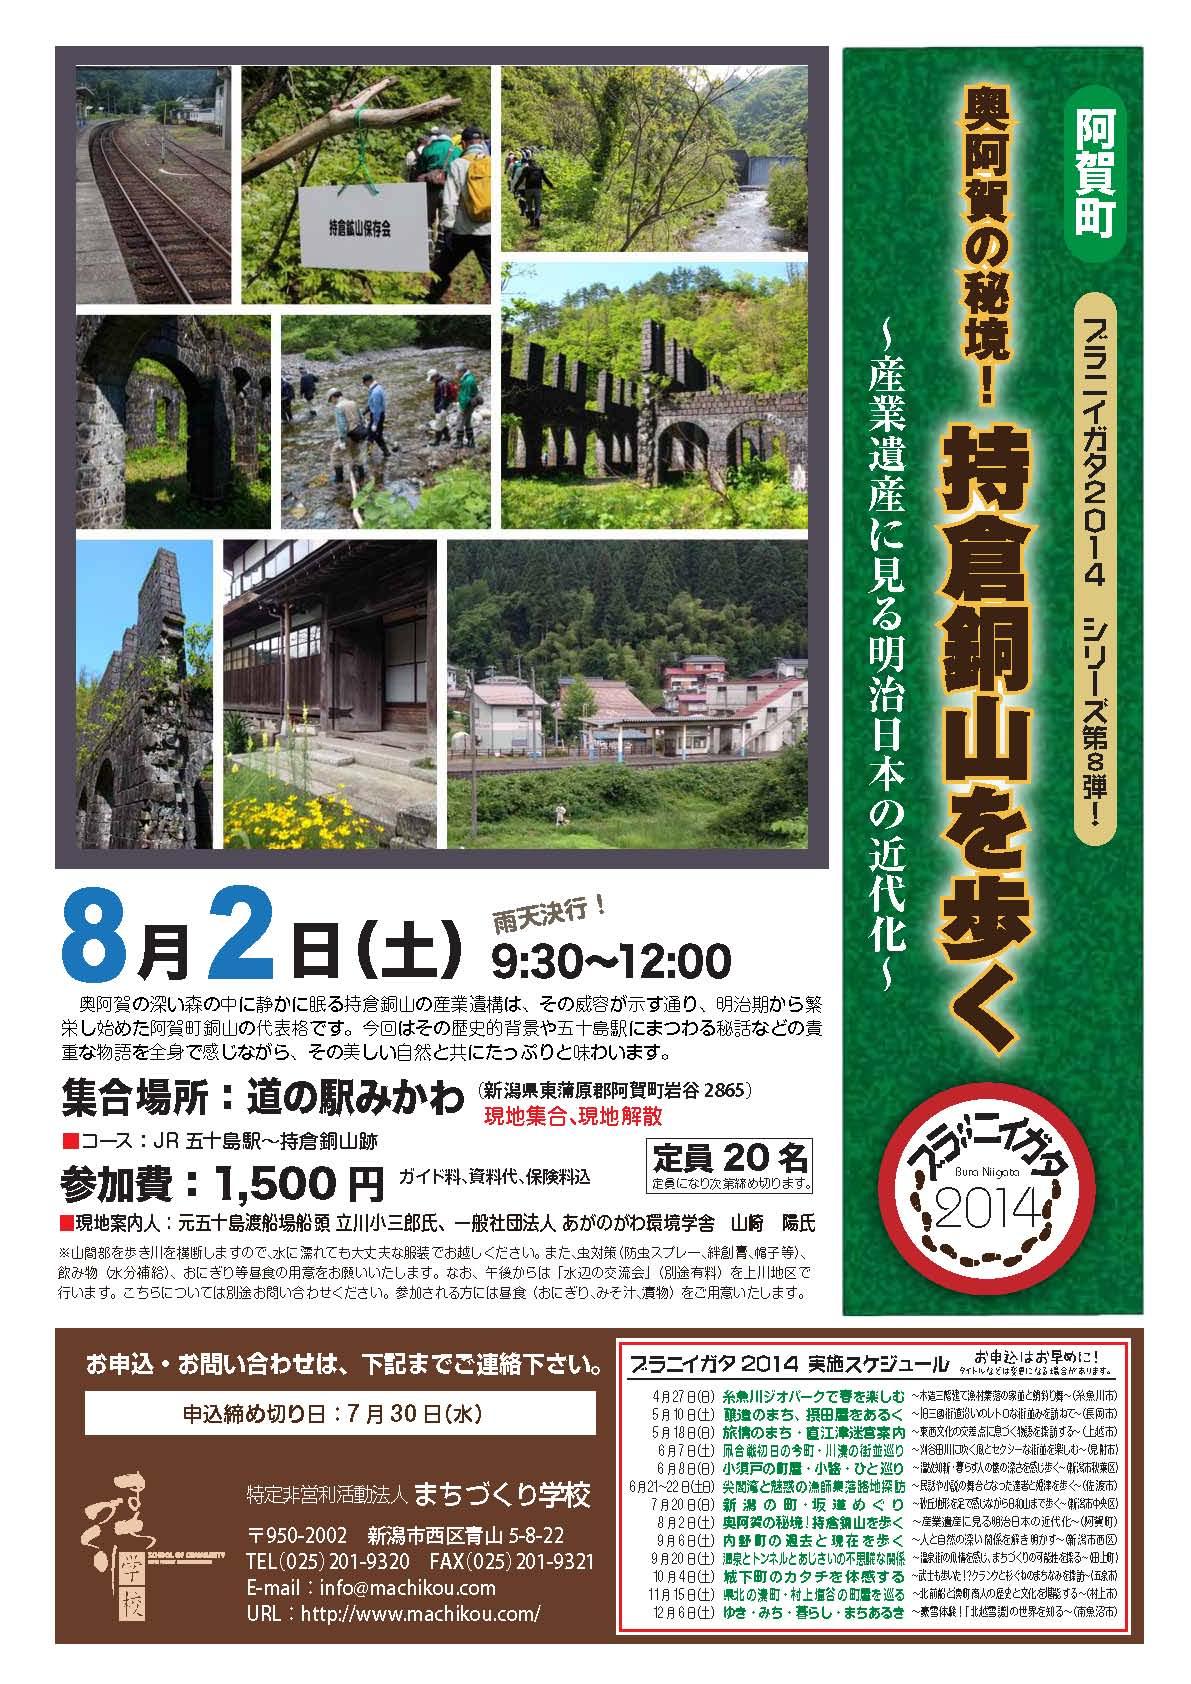 0802mochikuradouzan